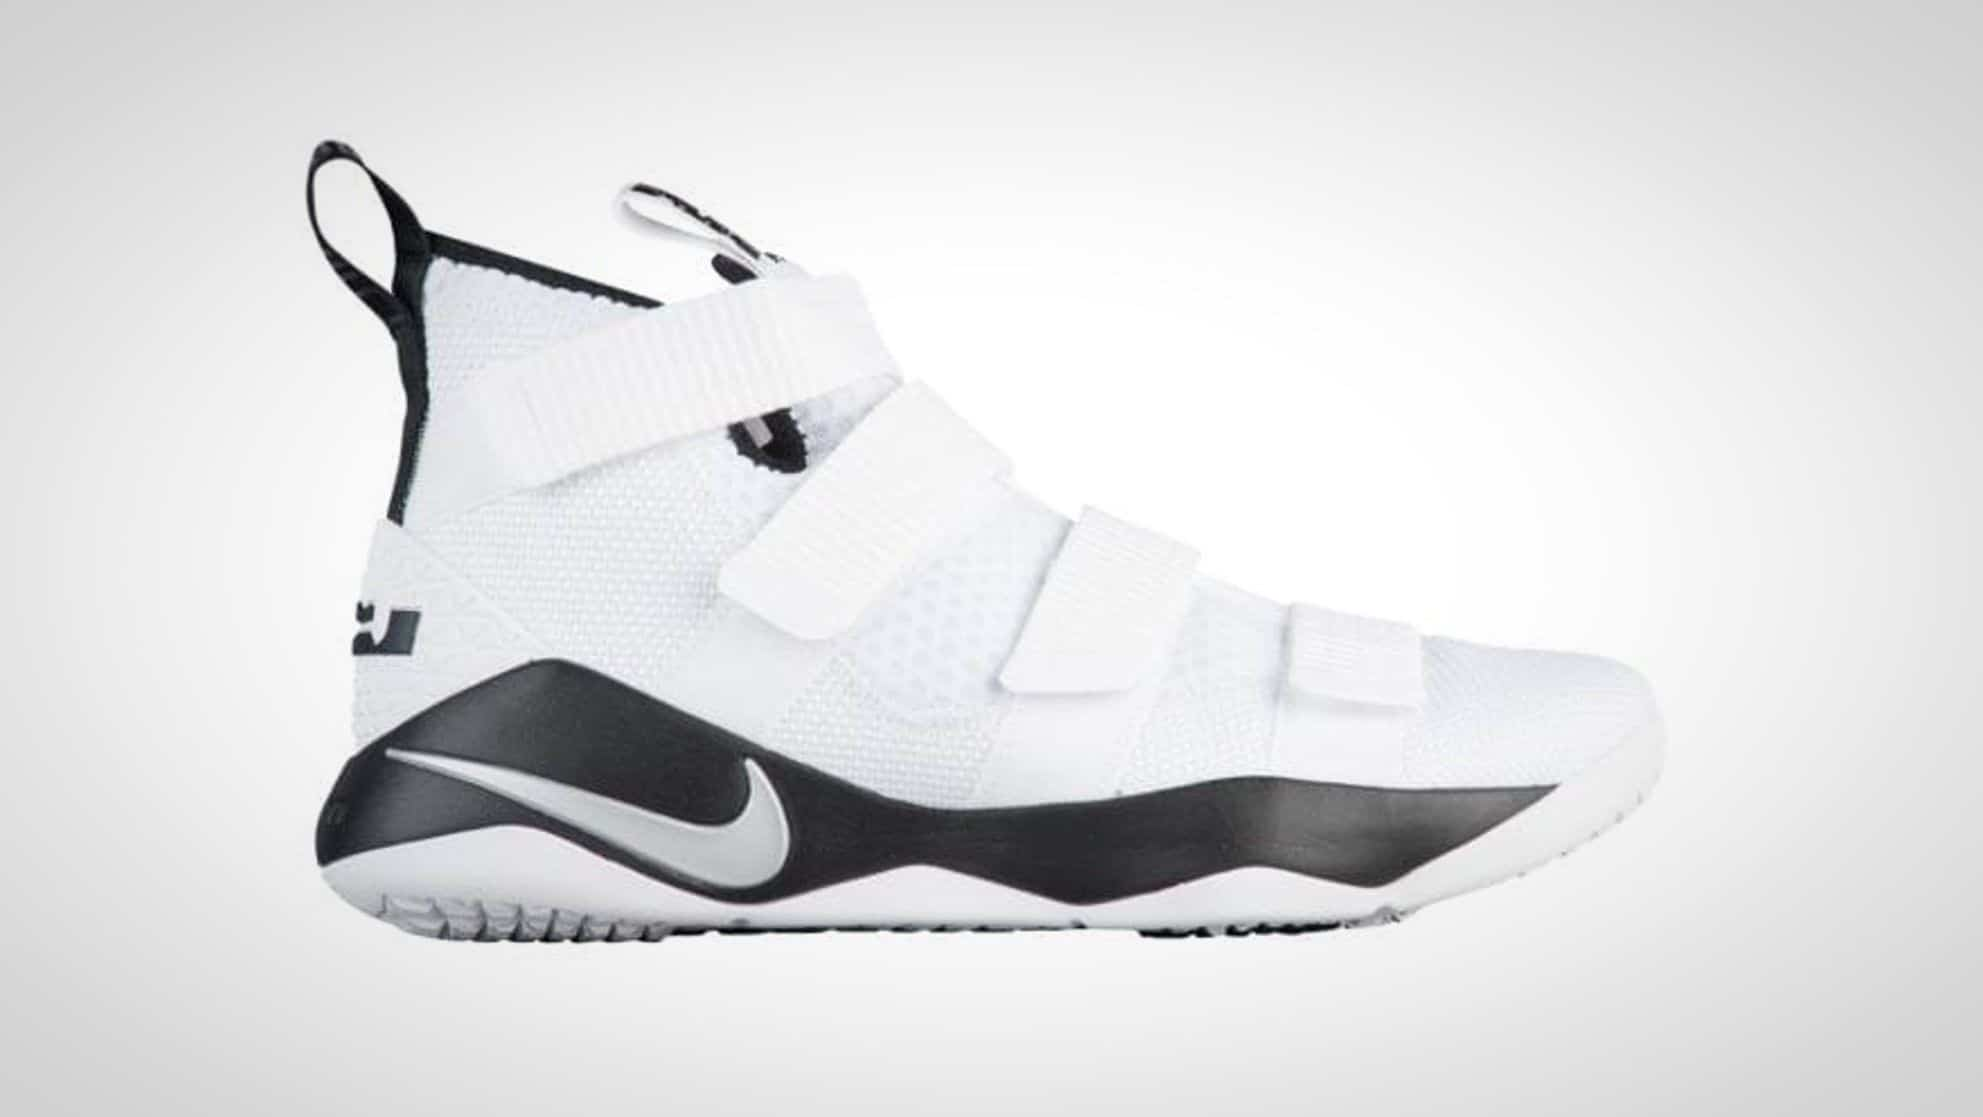 33d0fa55eeb Nike Lebron Soldier 11 Basketball Shoe Review - BestOutdoorBasketball